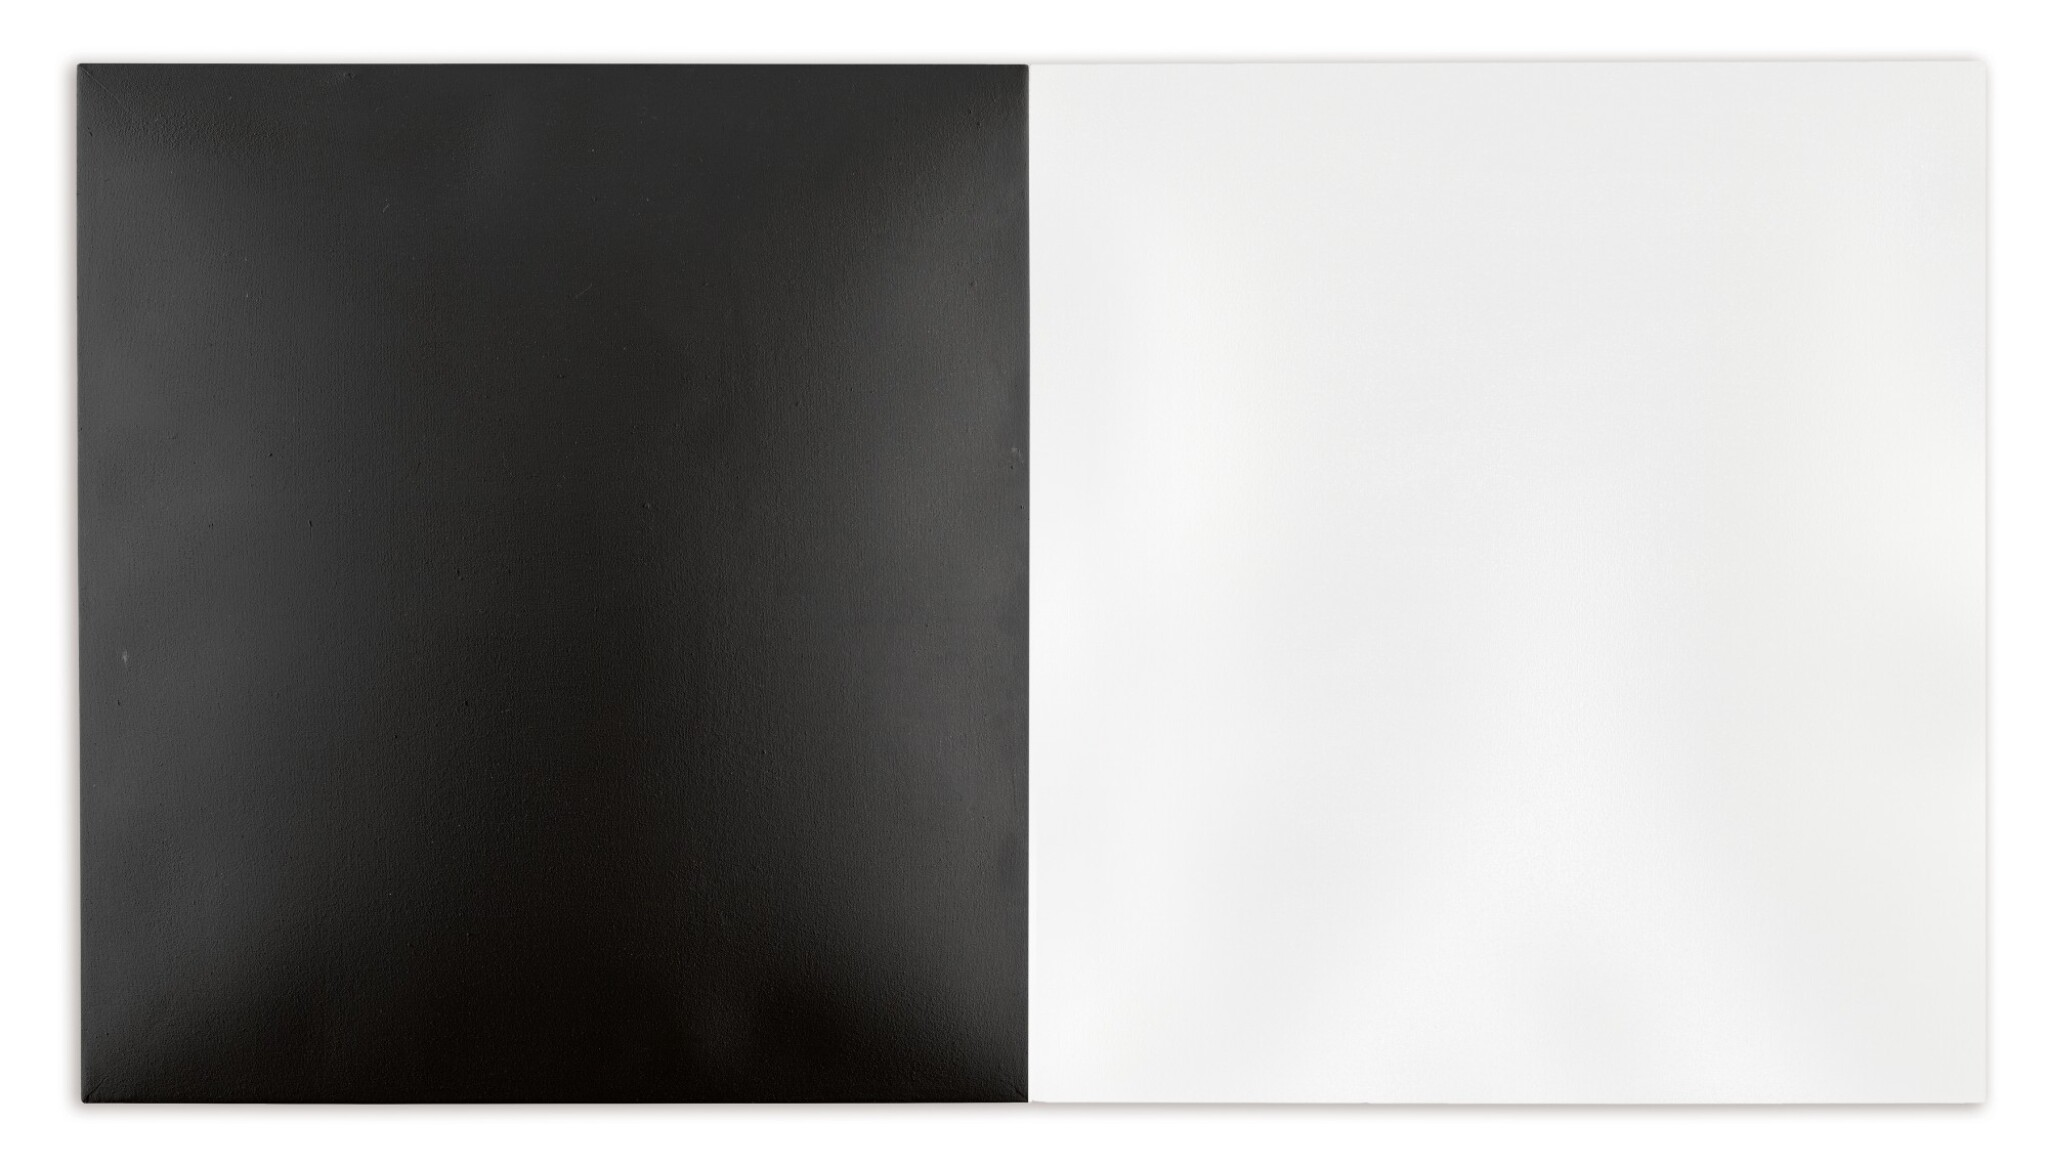 View 1 of Lot 105. A Conversation Piece (Black & White).